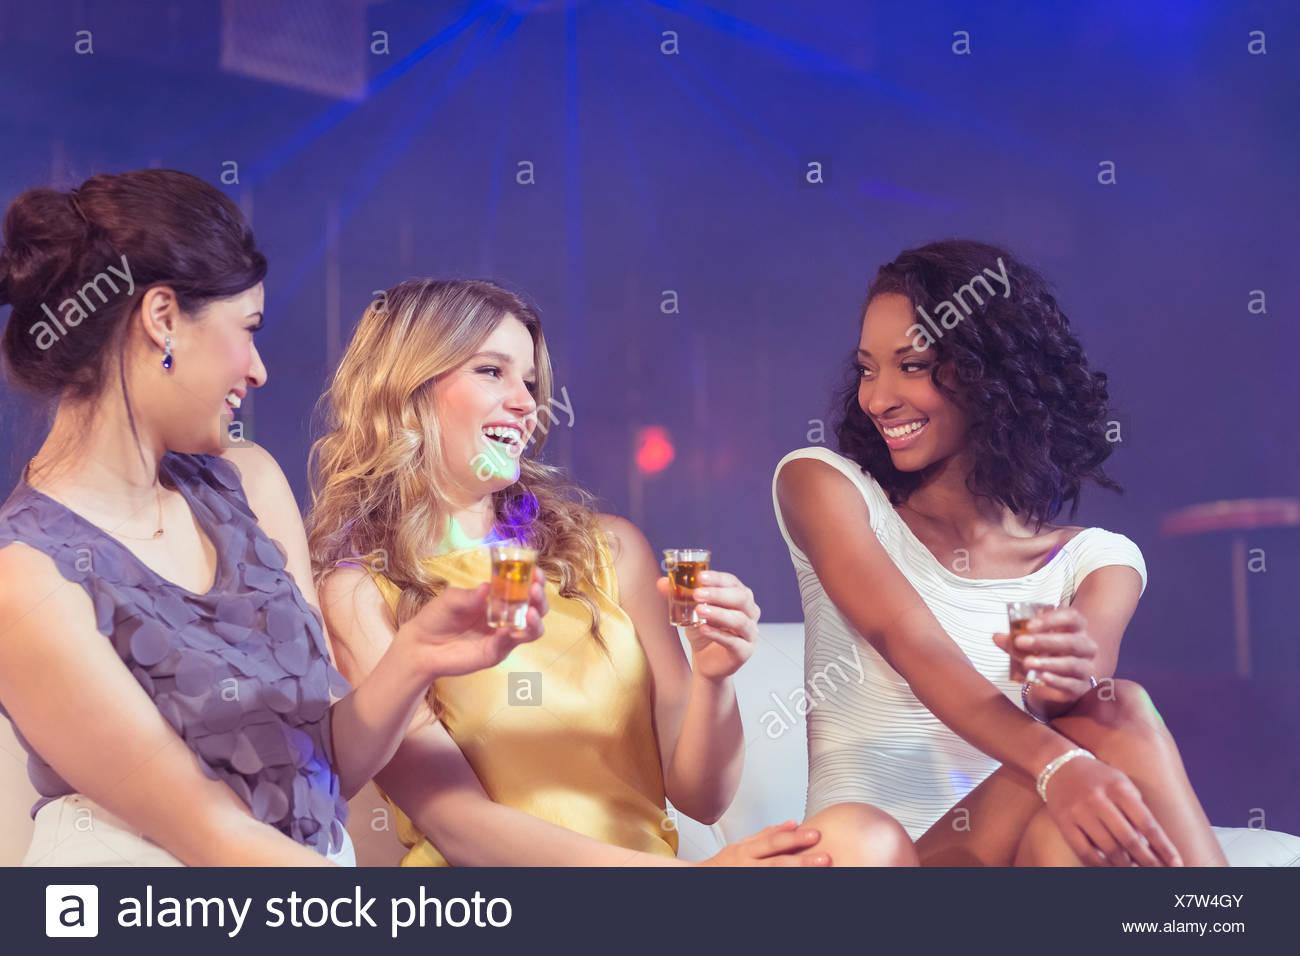 Pretty girls celebrating - Stock Image